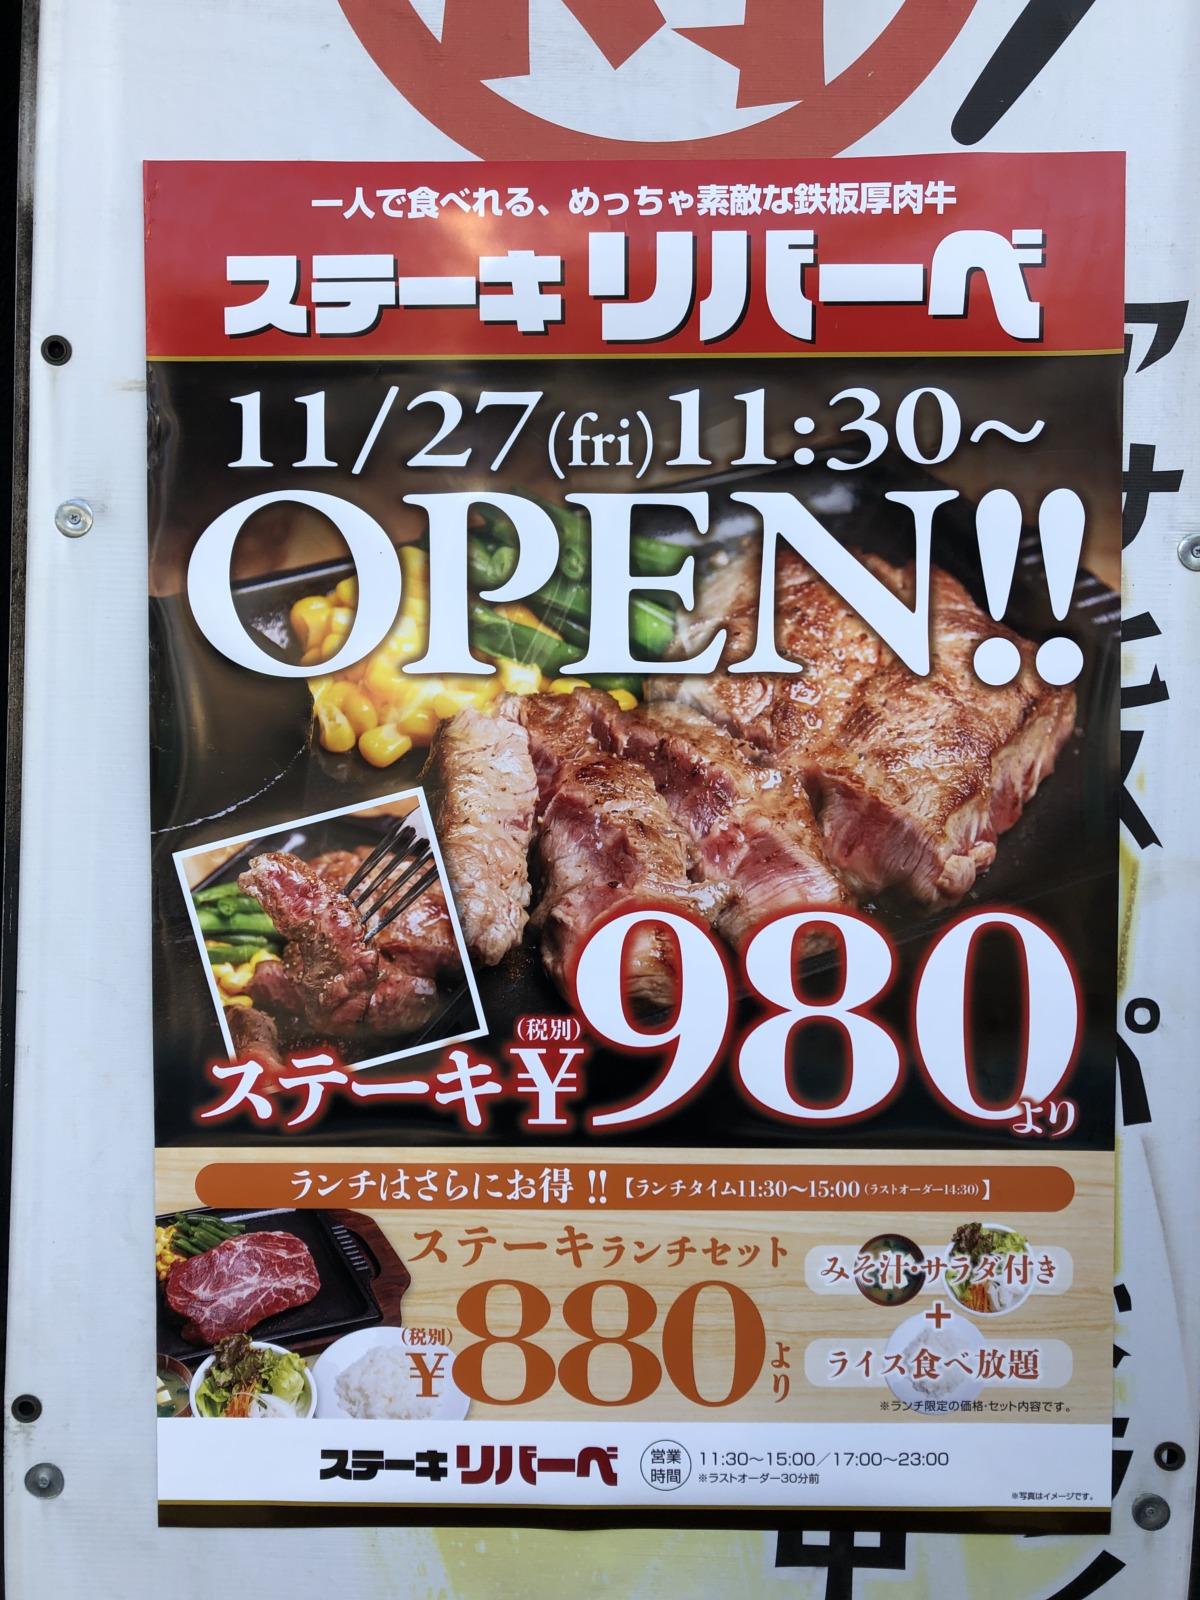 ステーキ リバーべ 深井 堺市